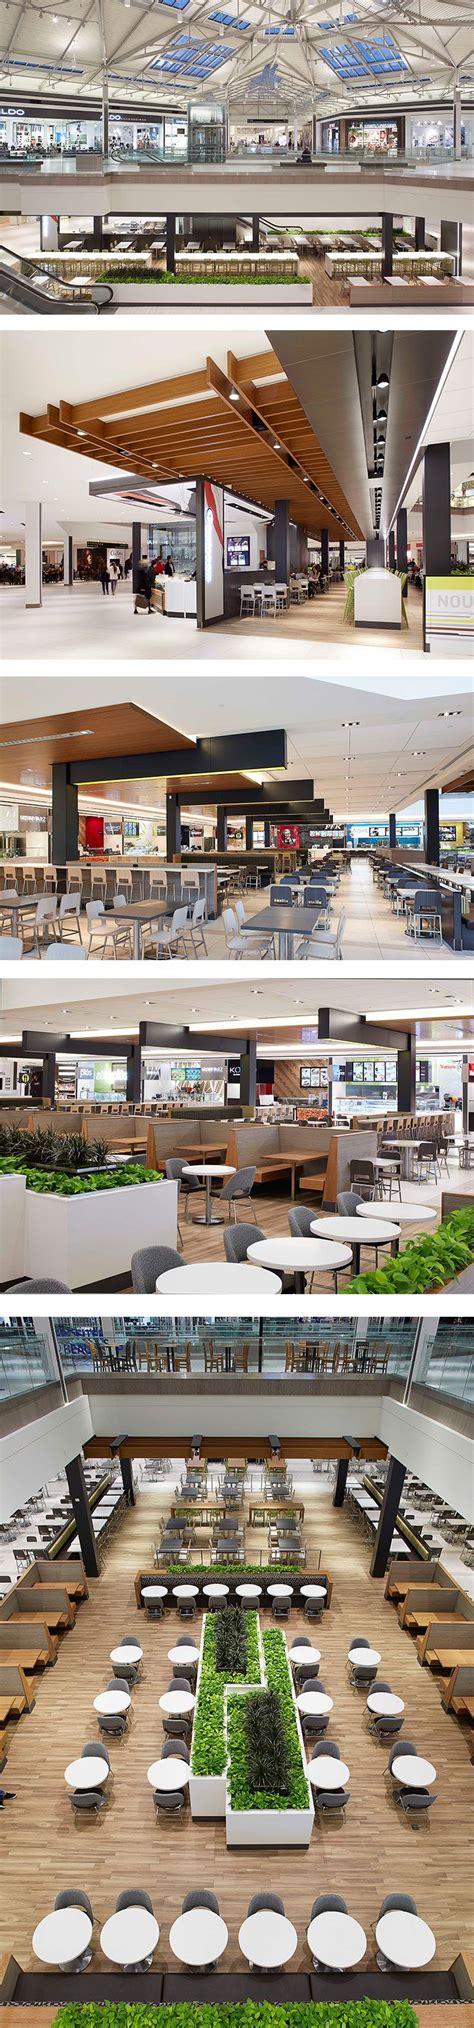 cuisine collaborative best 20 food court ideas on food court design